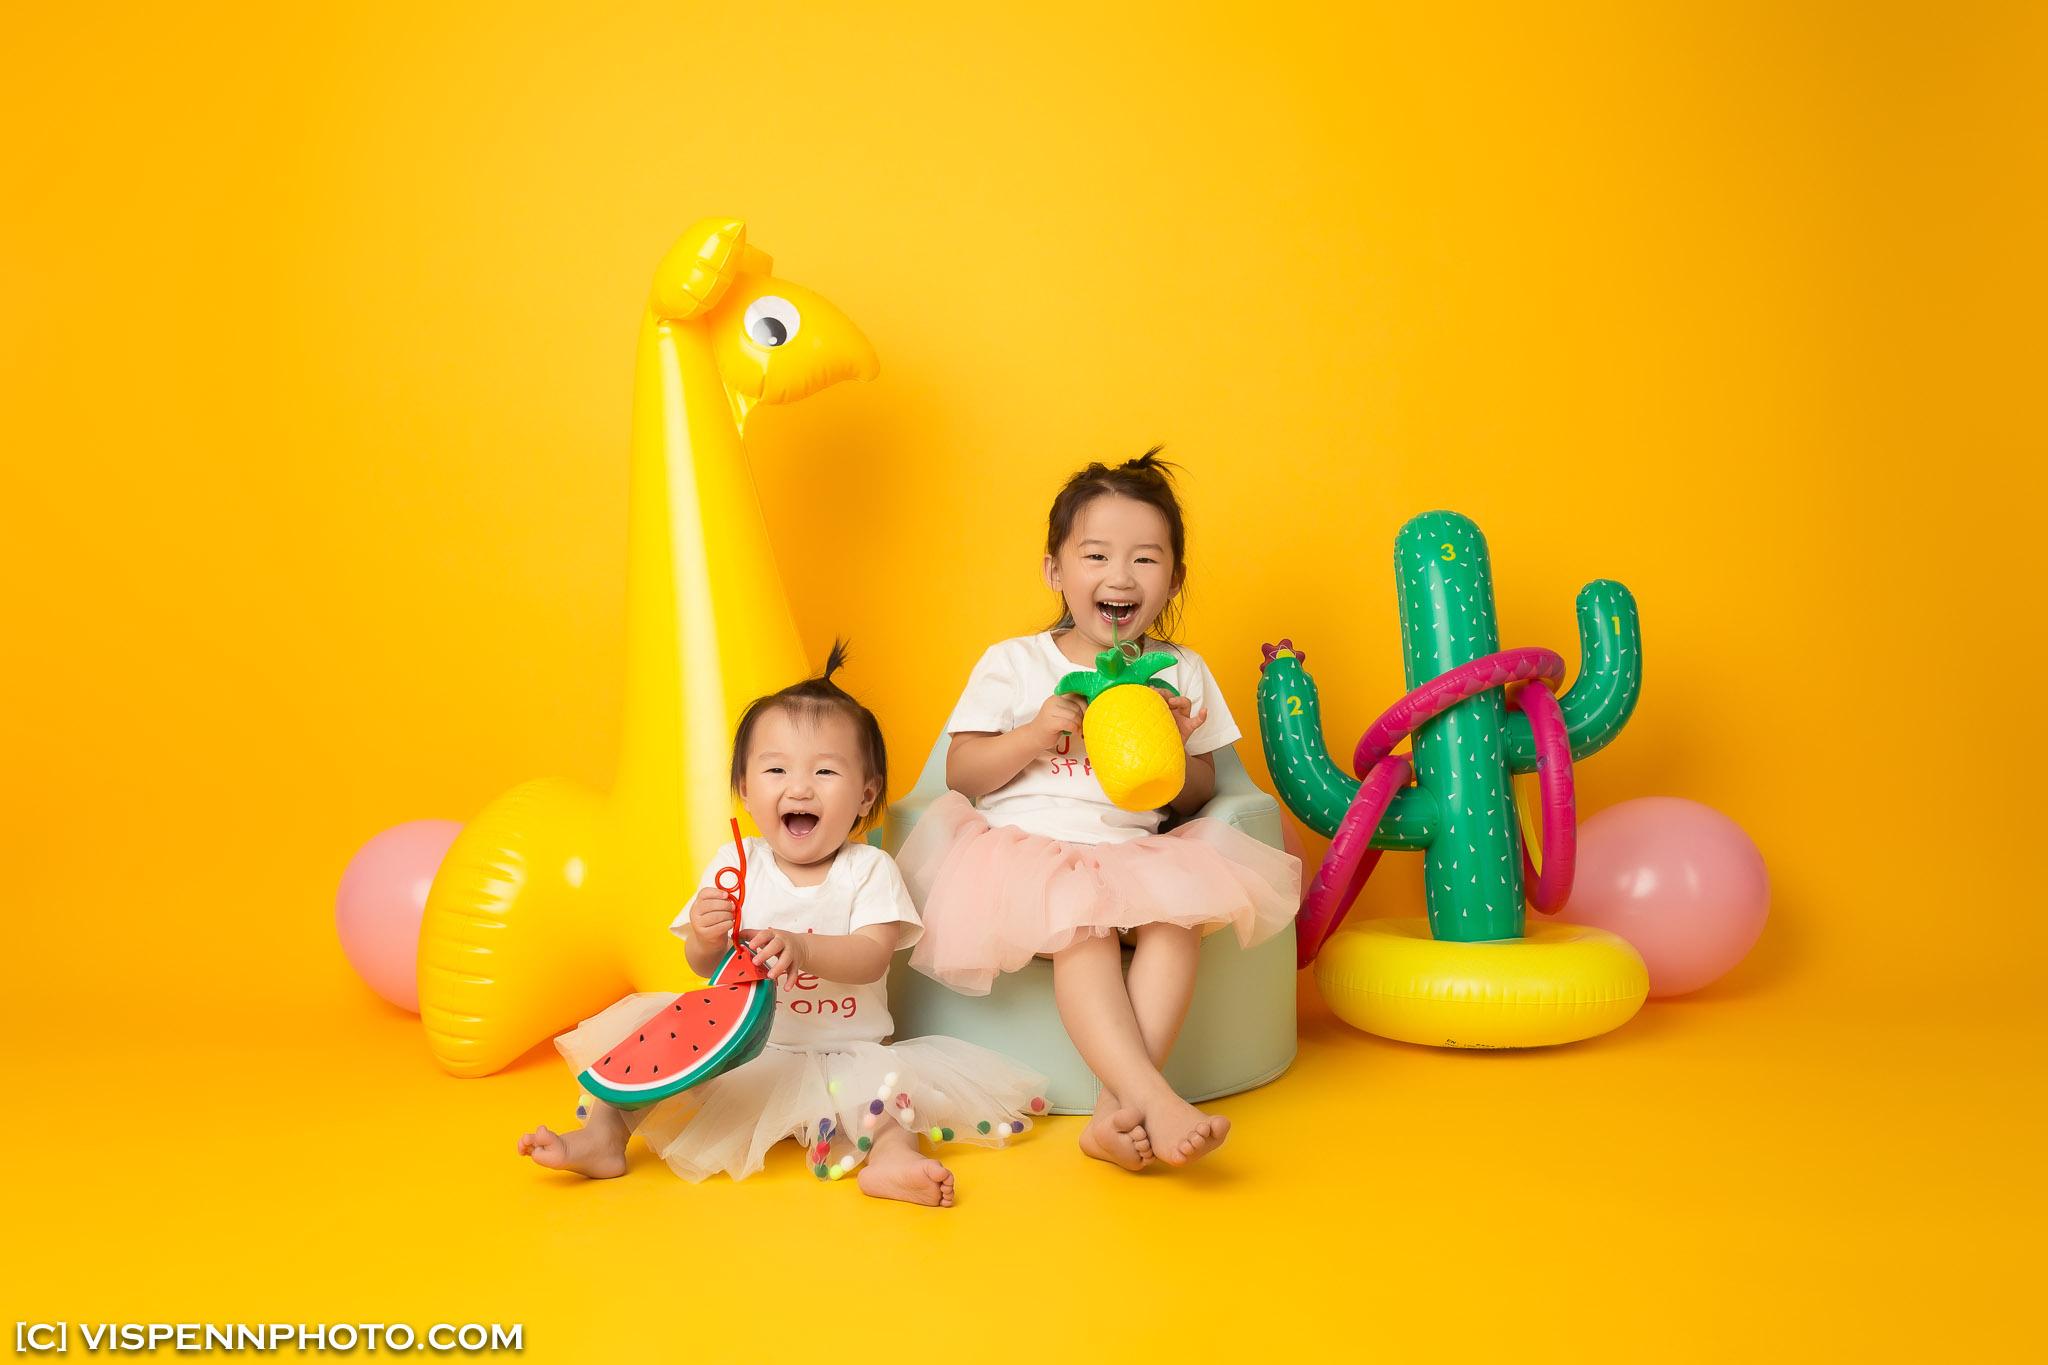 Melbourne Newborn Baby Family Photo BaoBao VISPENN 墨尔本 儿童 宝宝 百天照 满月照 孕妇照 全家福 KIDS VISPENN RitaLin 2048